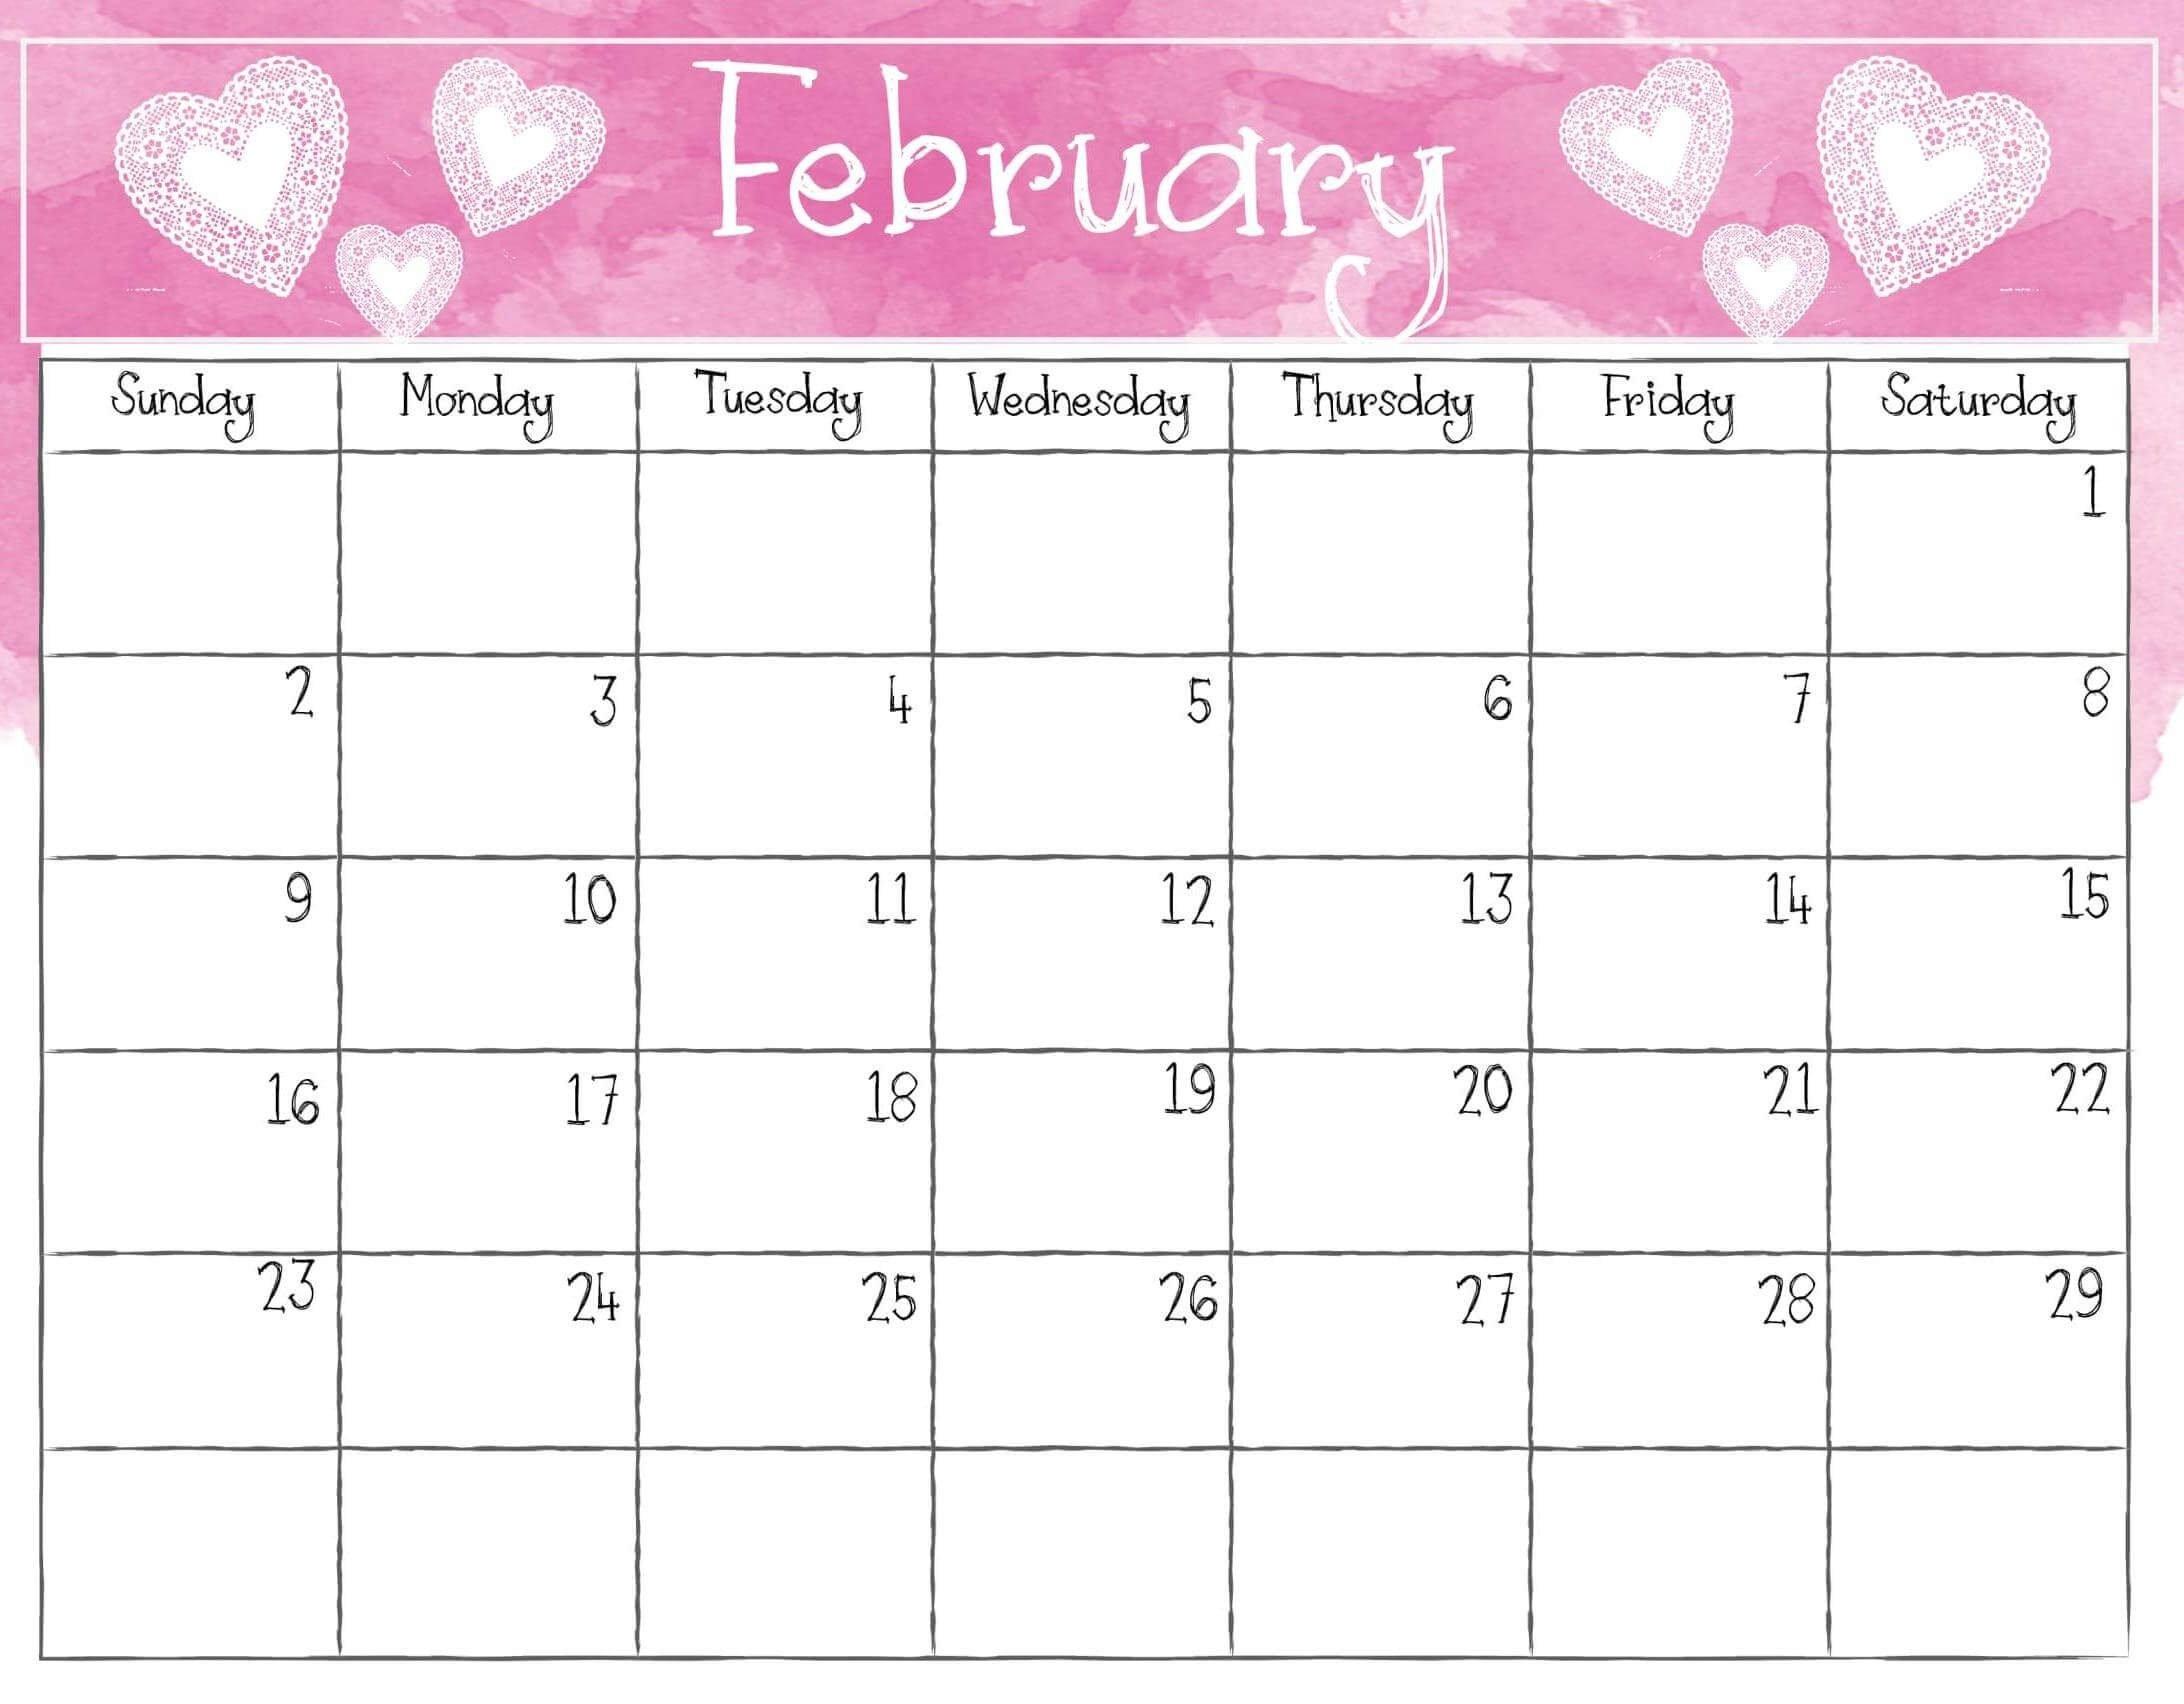 February 2020 Calendar Pdf, Excel Sheet | Free Printable regarding Printable February Calendar Pdf Graphics